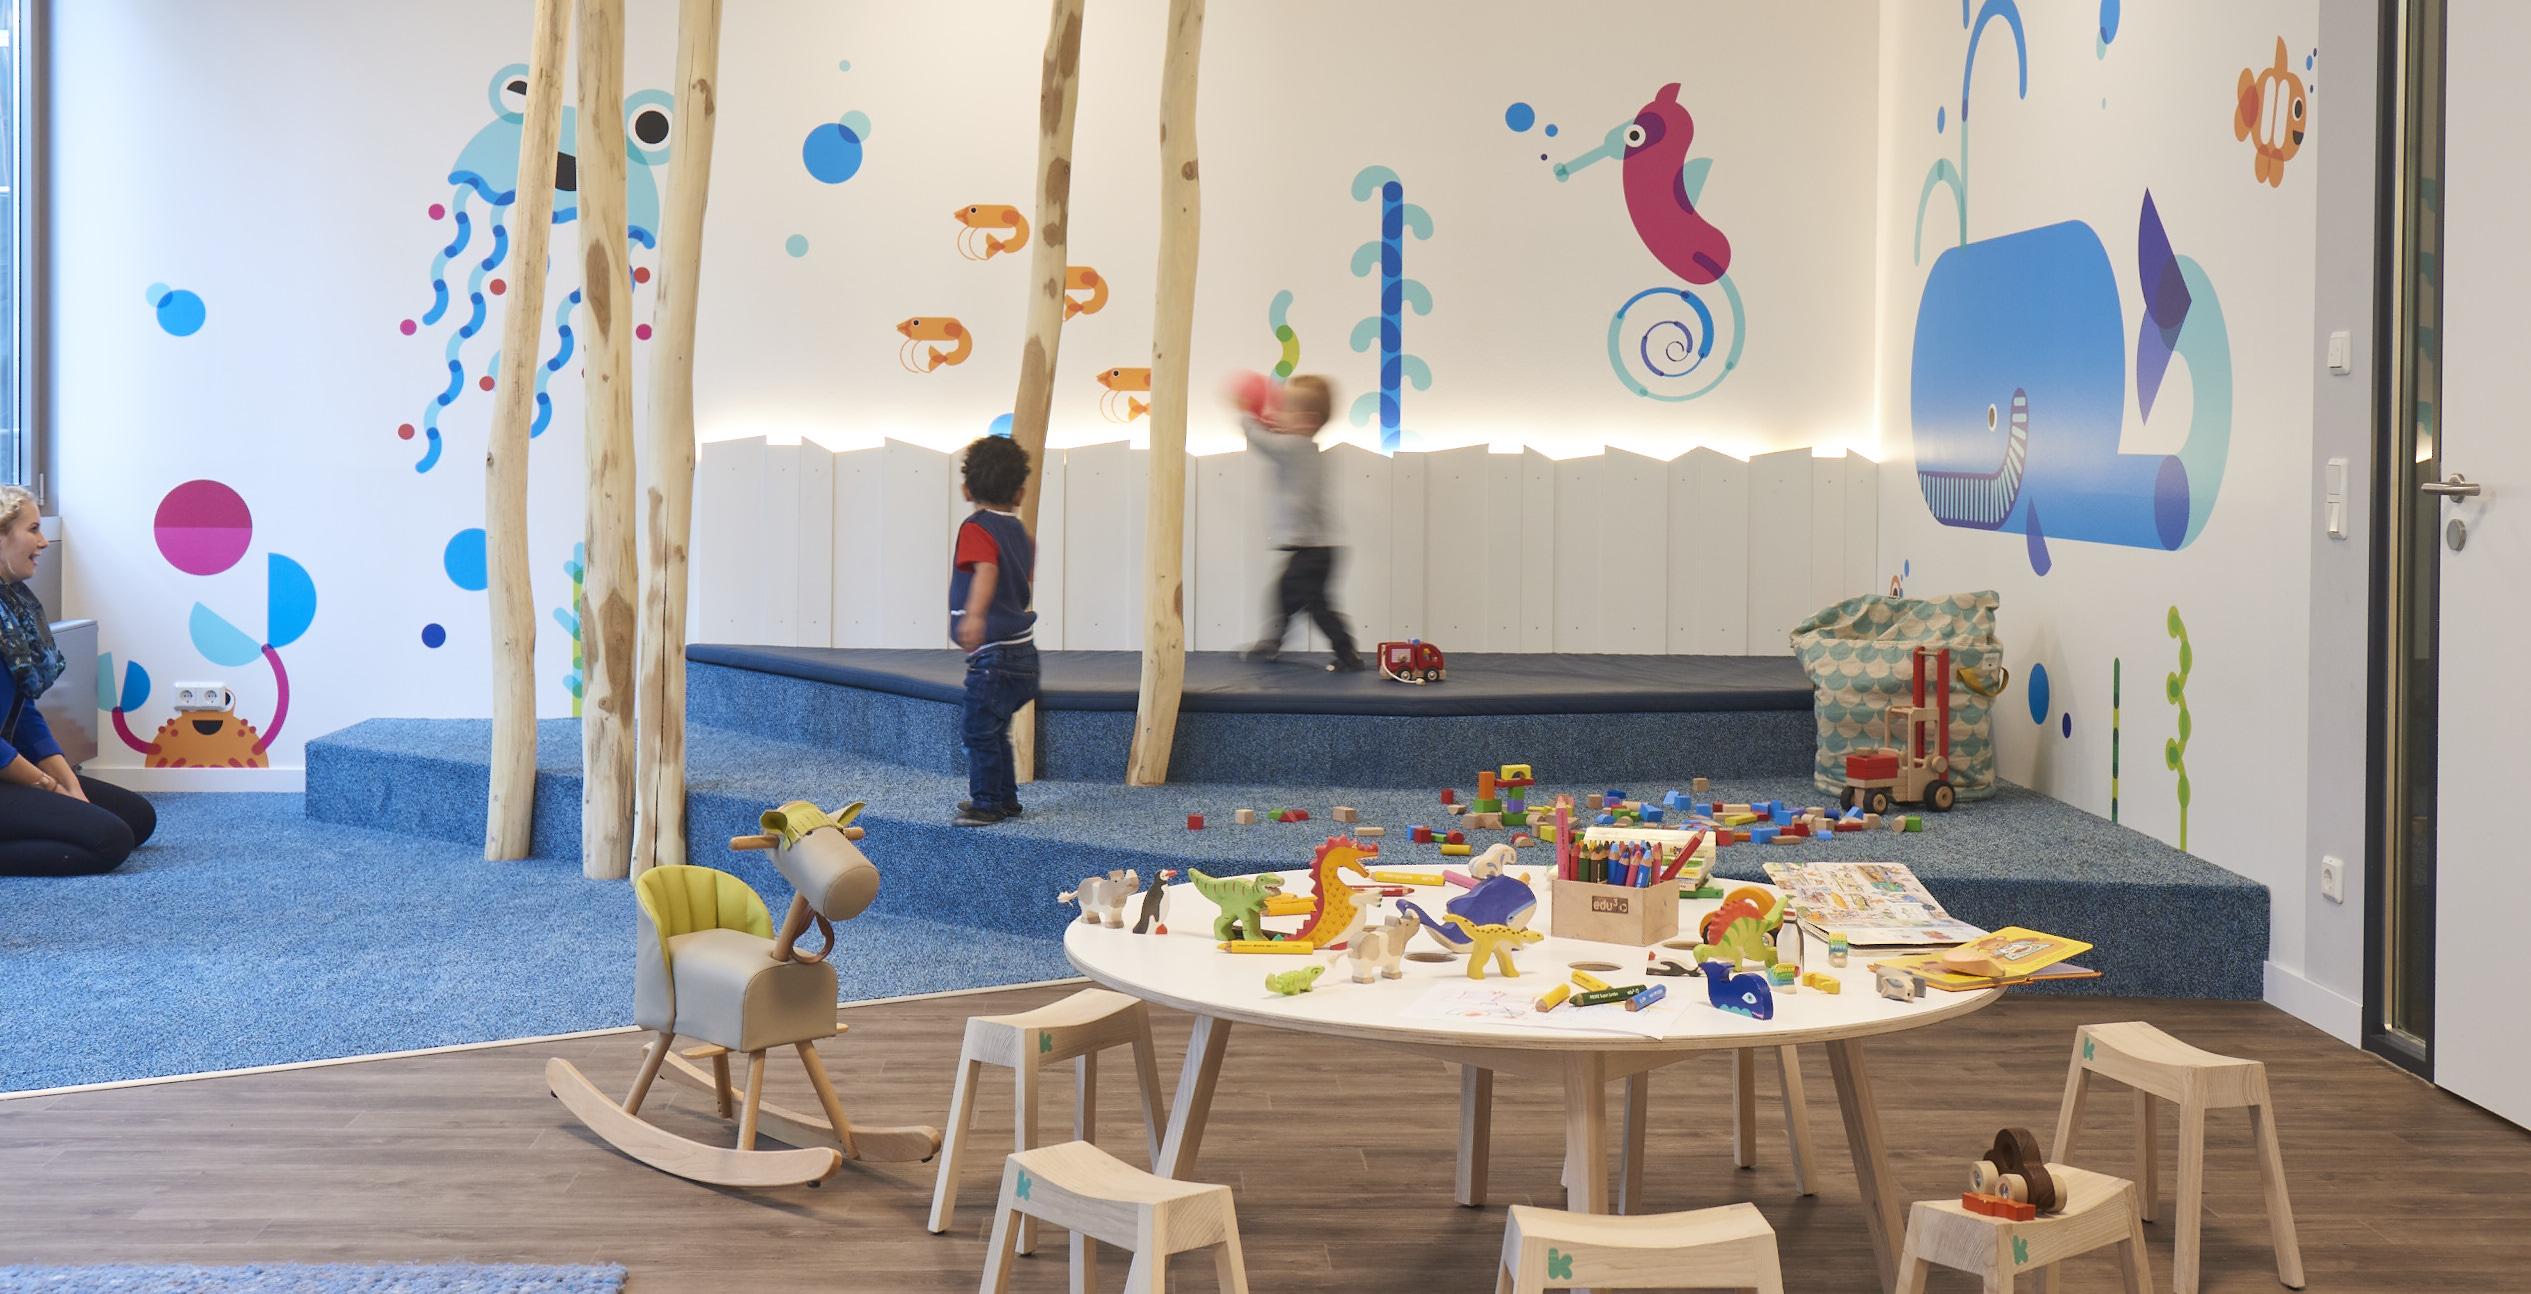 Kinderzimmer Kita | Kita Kinderzimmer Hamburg Verwaltung In 22763 Hamburg